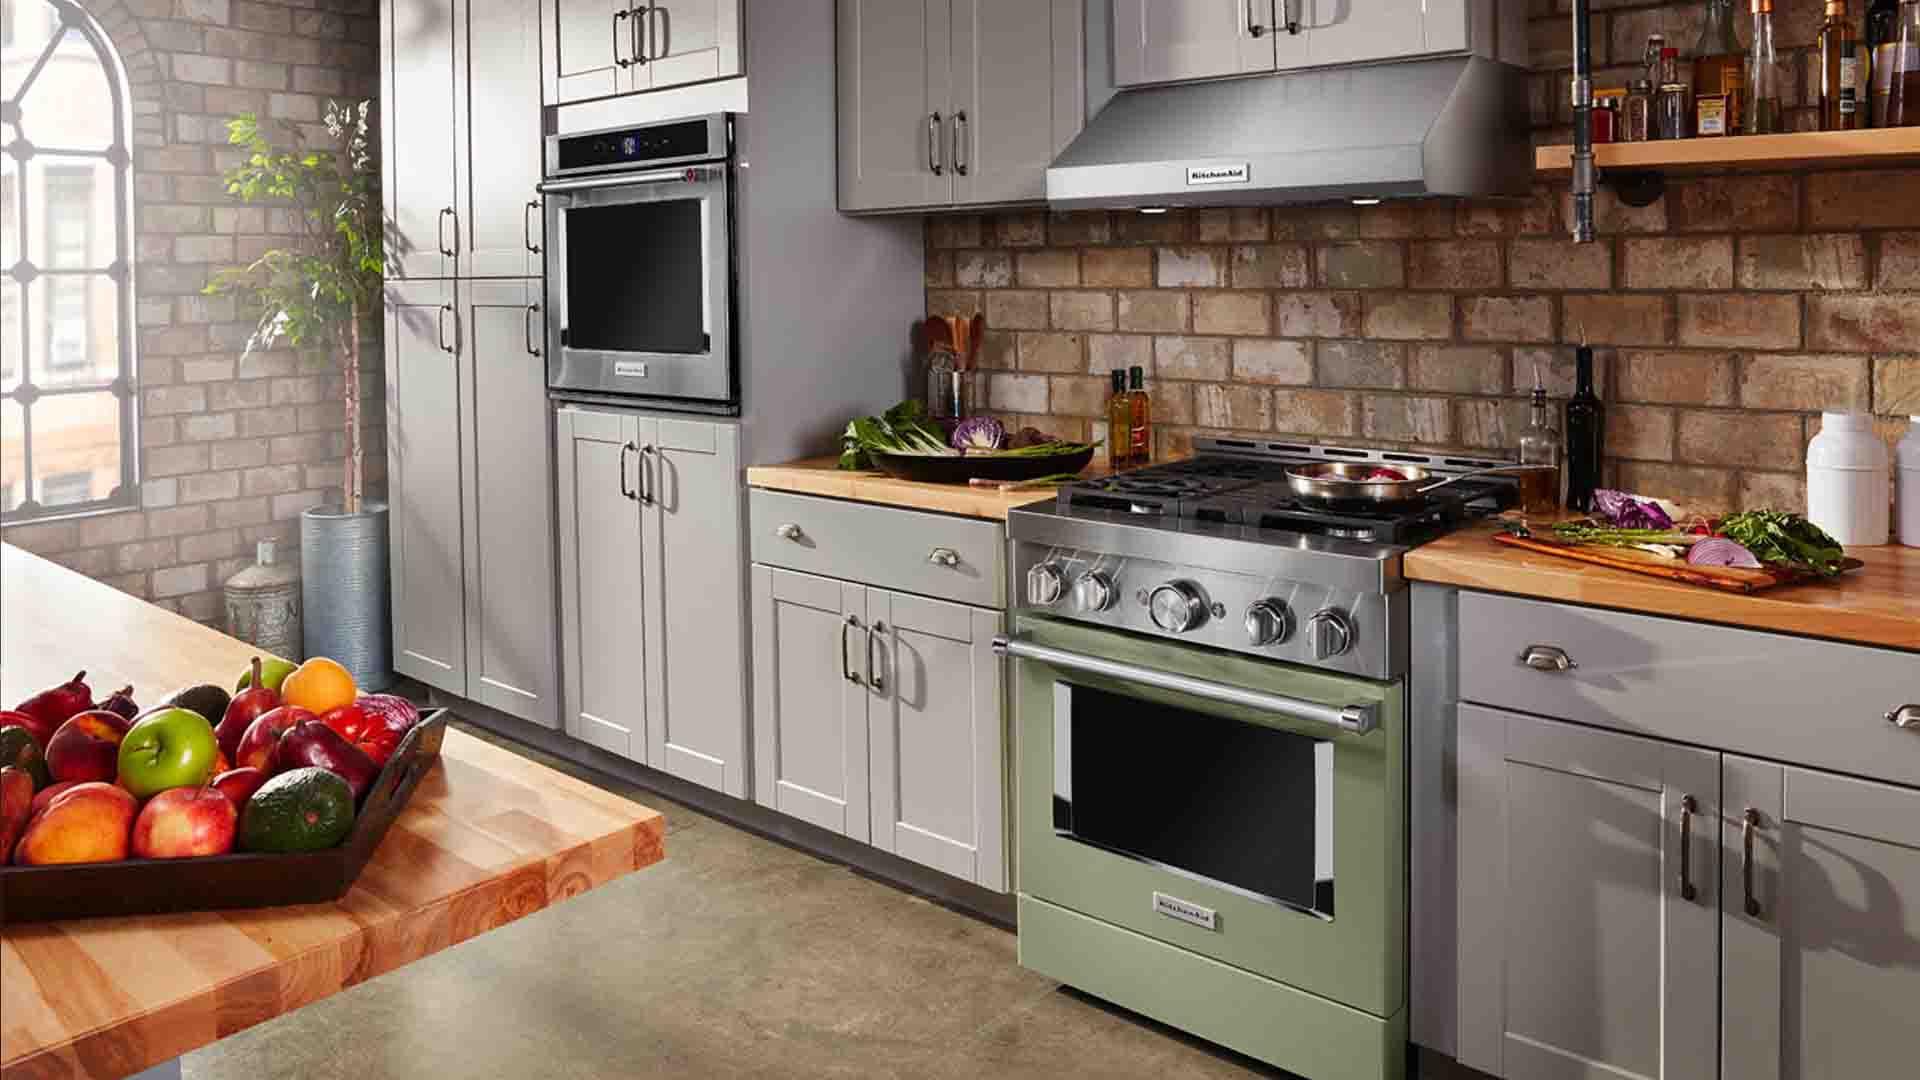 KitchenAid Commercial Style Range Repair Service   KitchenAid Repairs